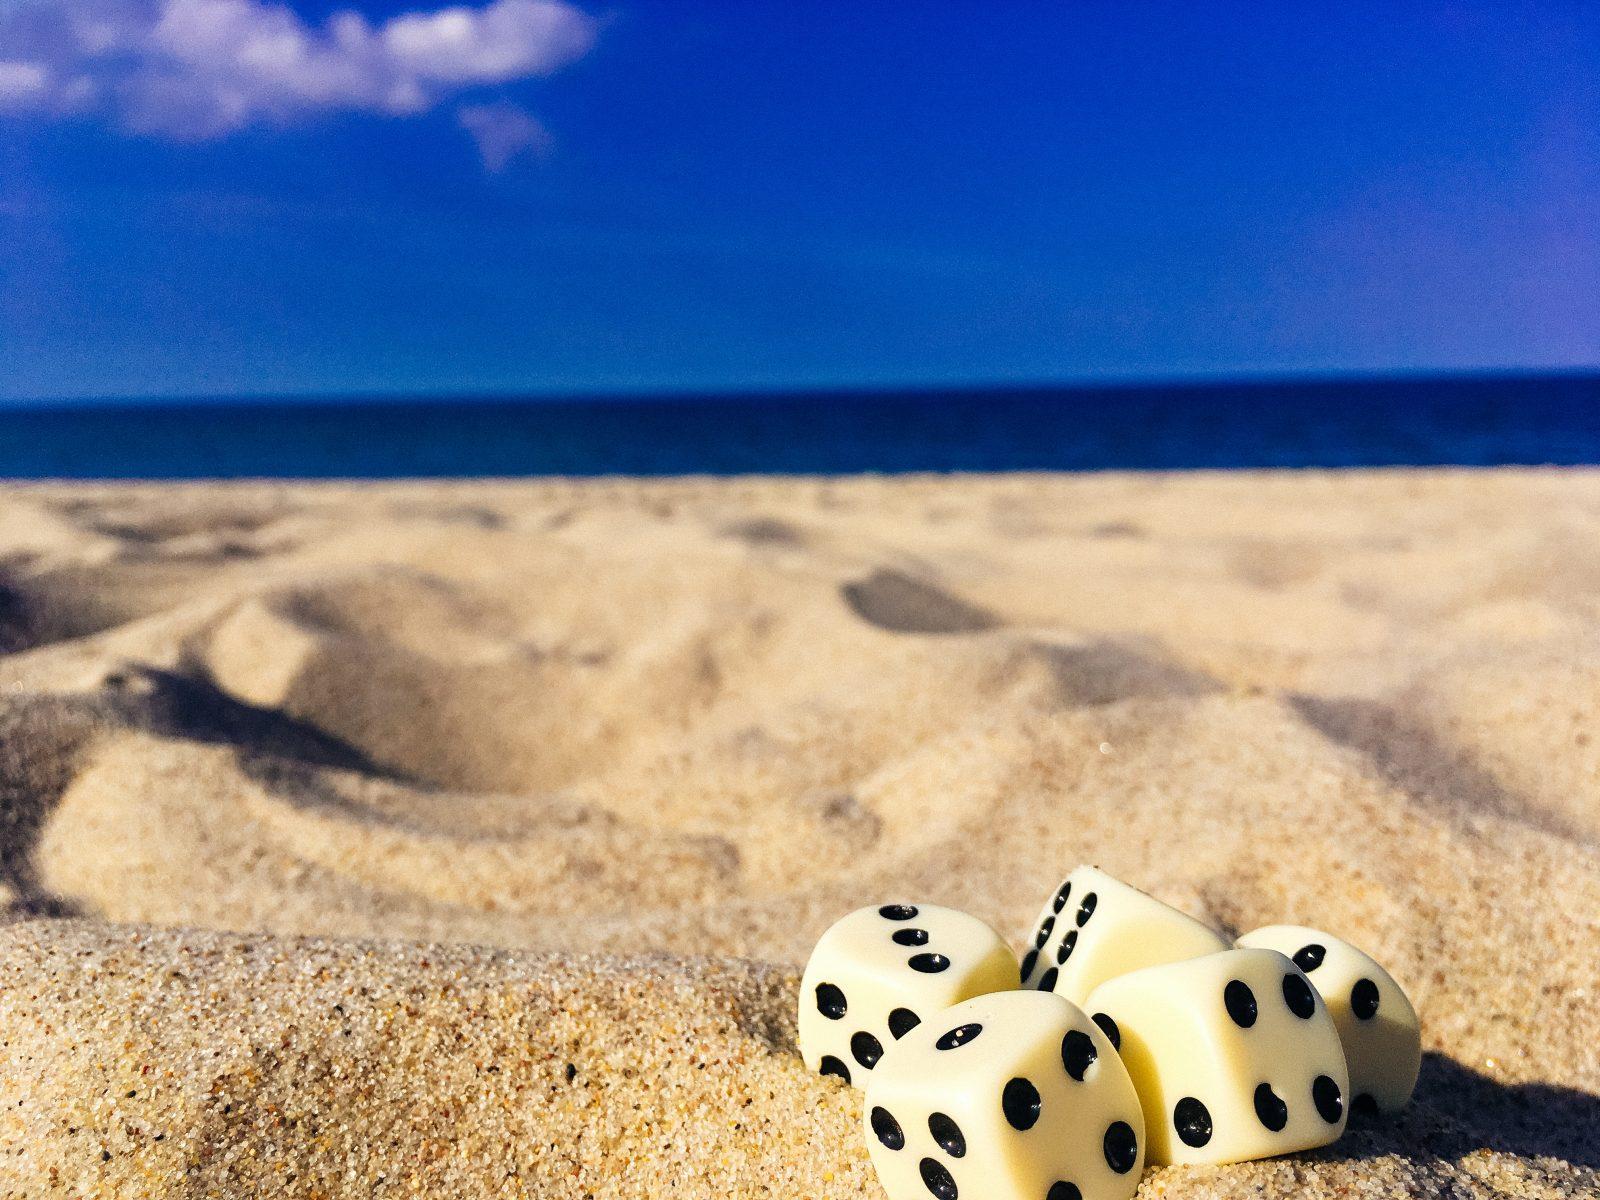 geluk 5 dobbelstenen in het strandzand